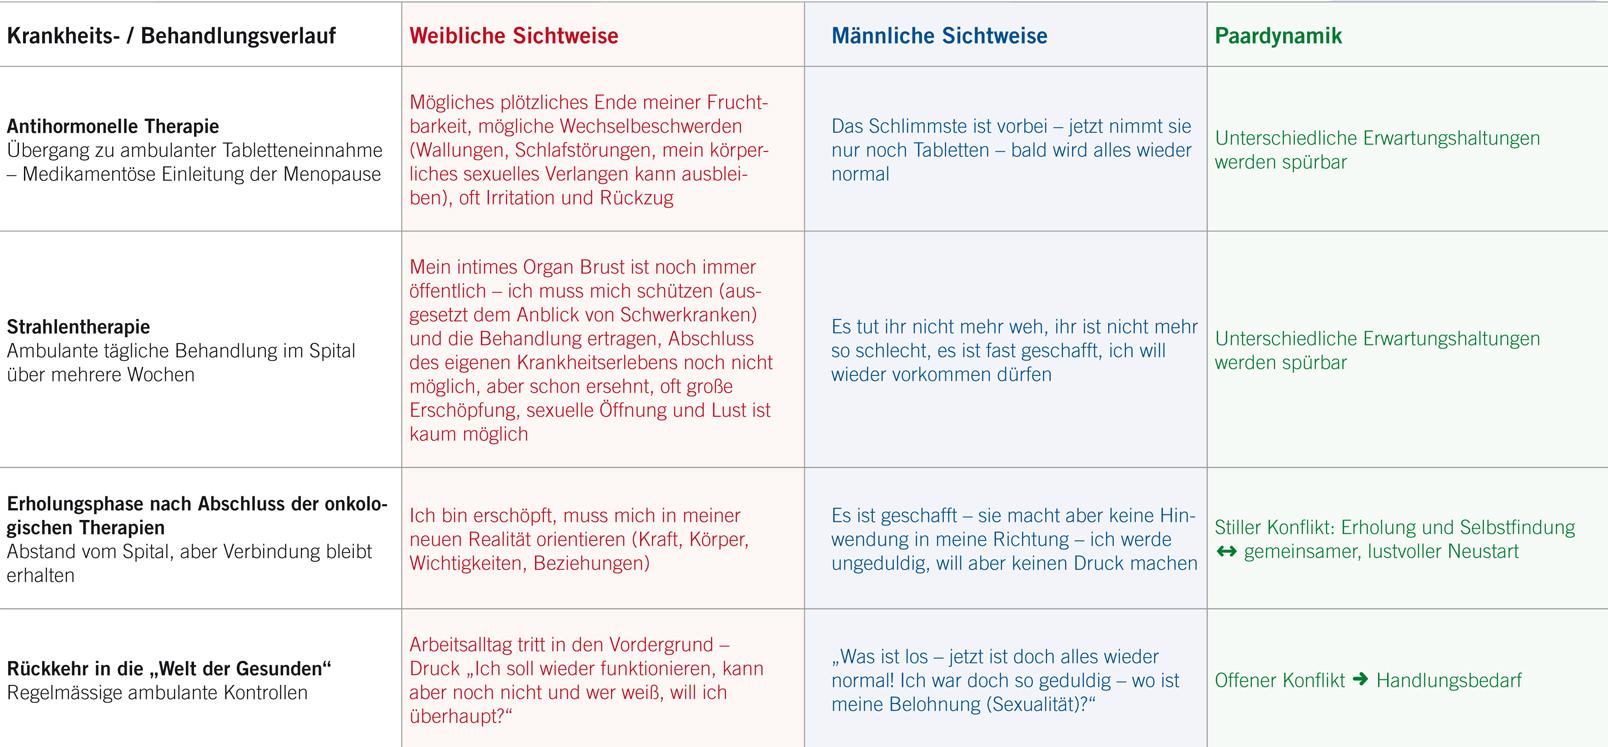 Tolle Menschlicher Körper Tabelle Ideen - Anatomie Ideen - finotti.info